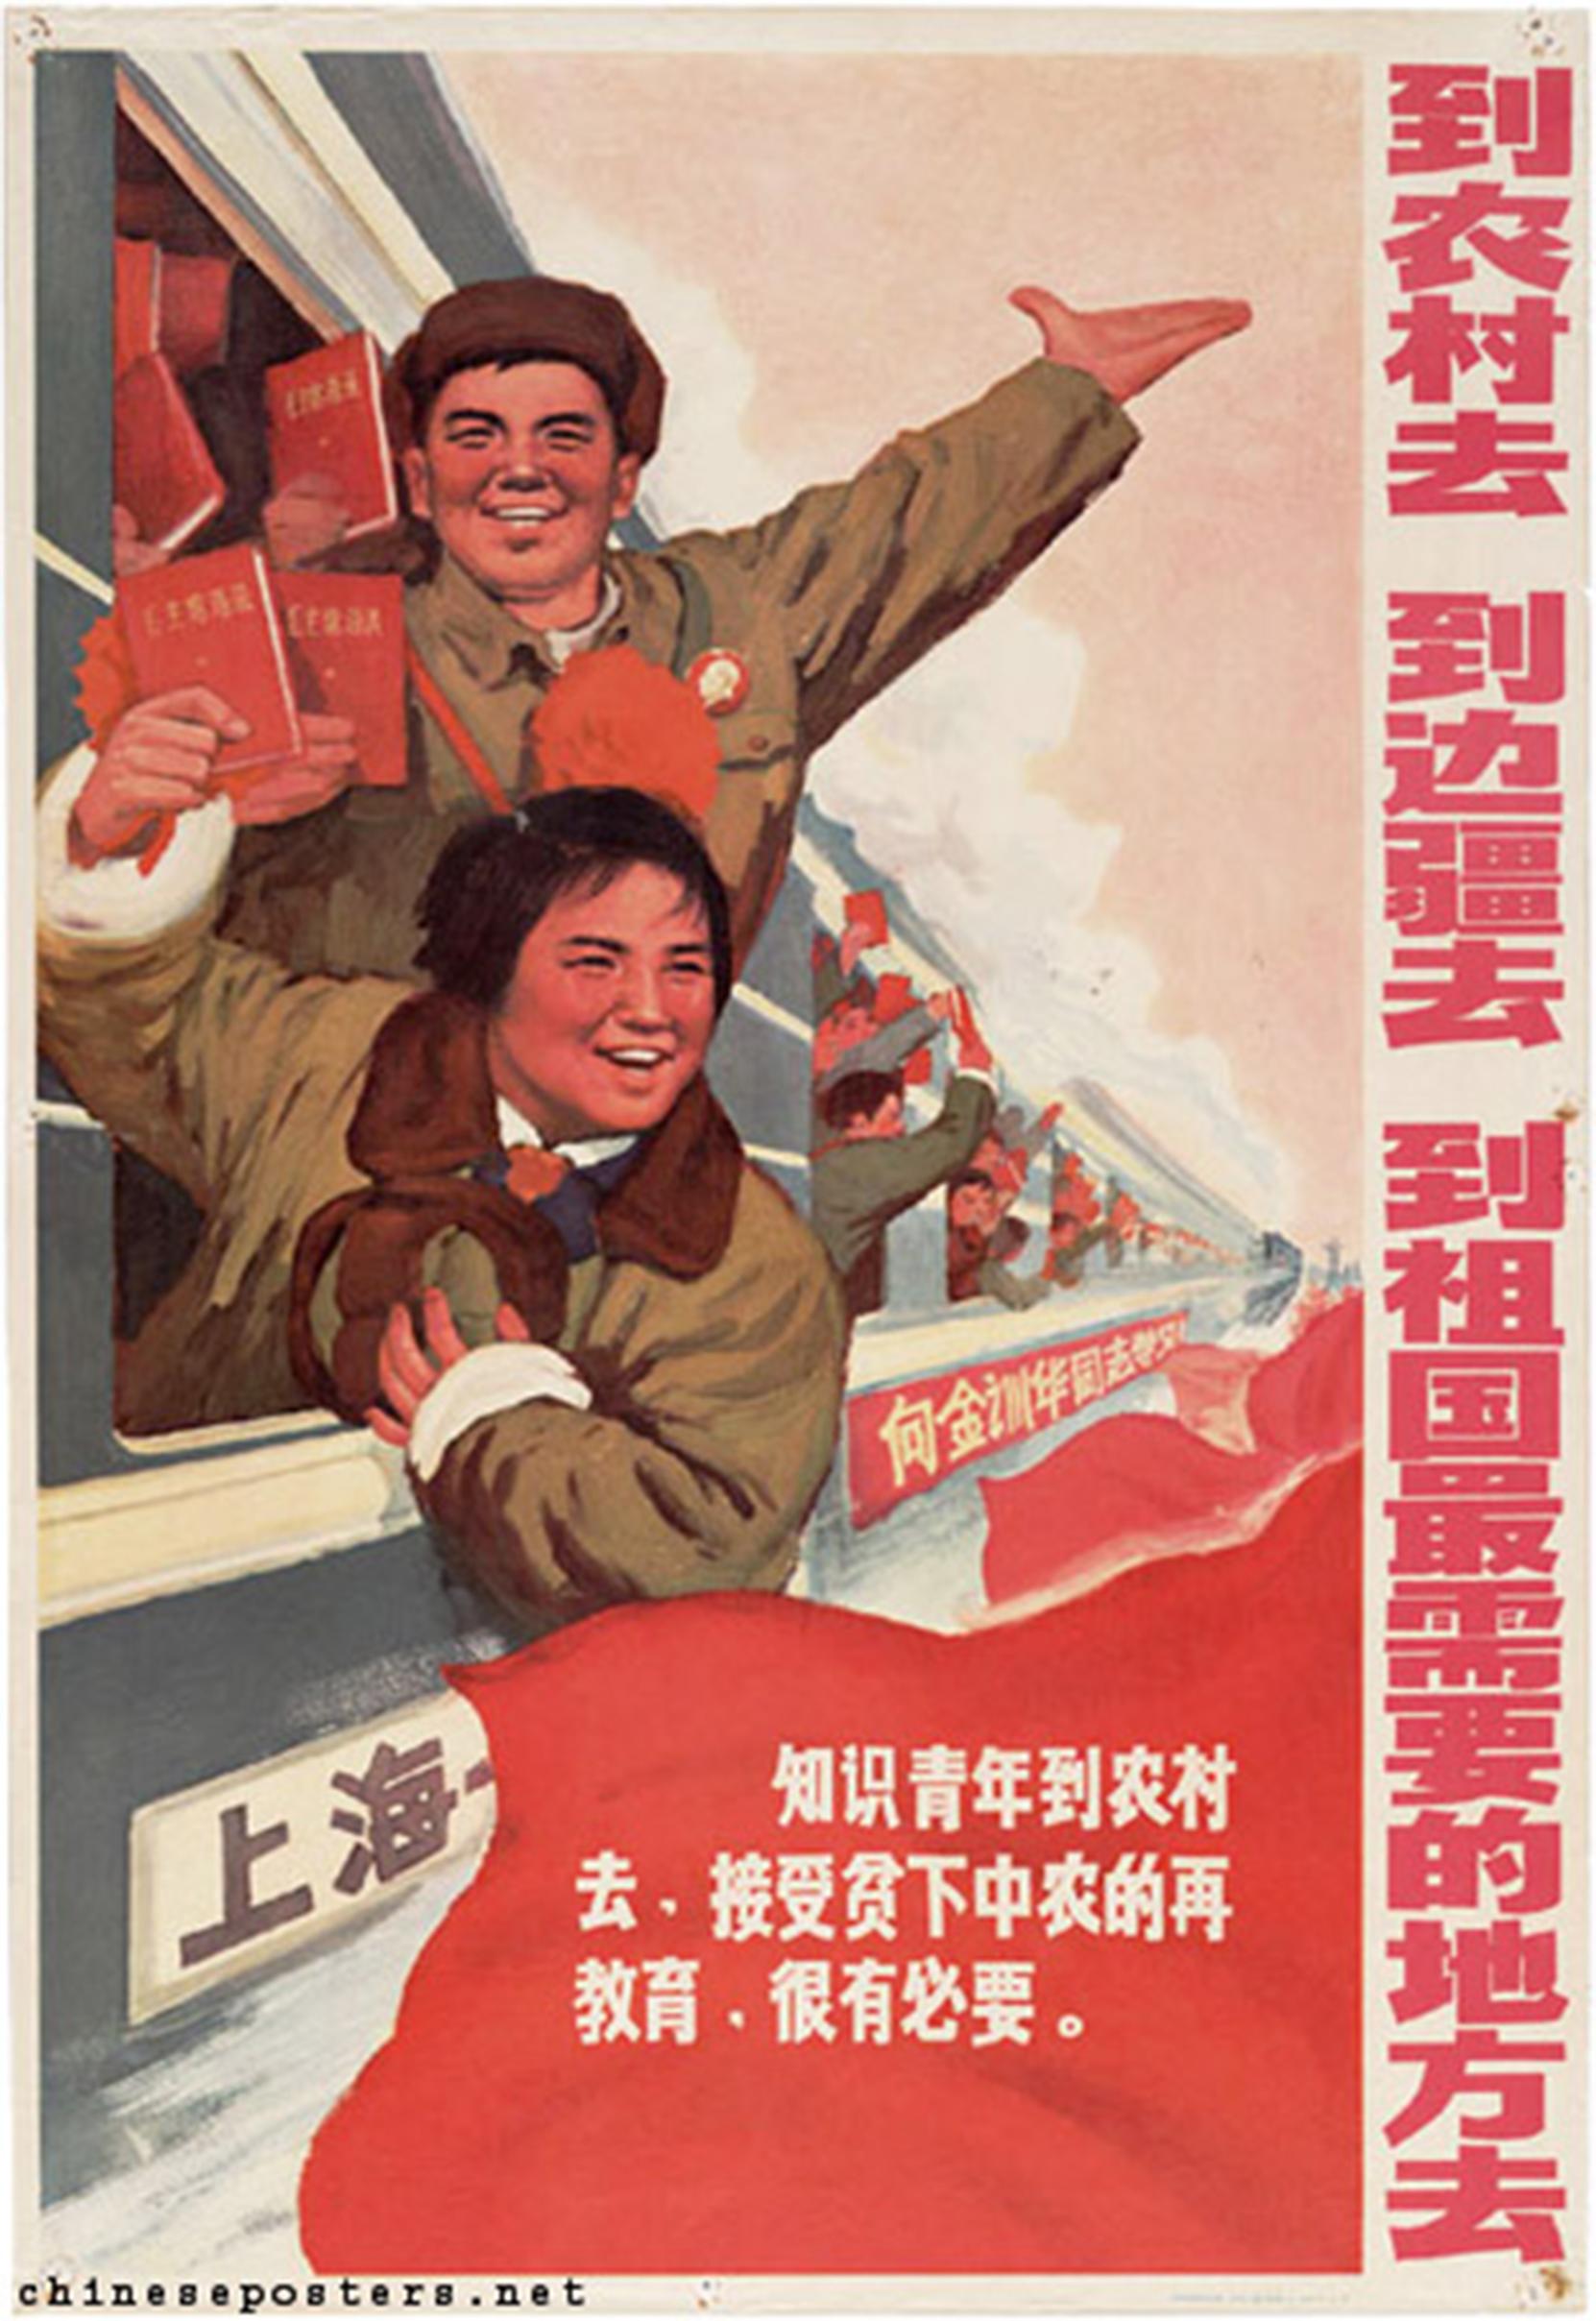 chineseposter